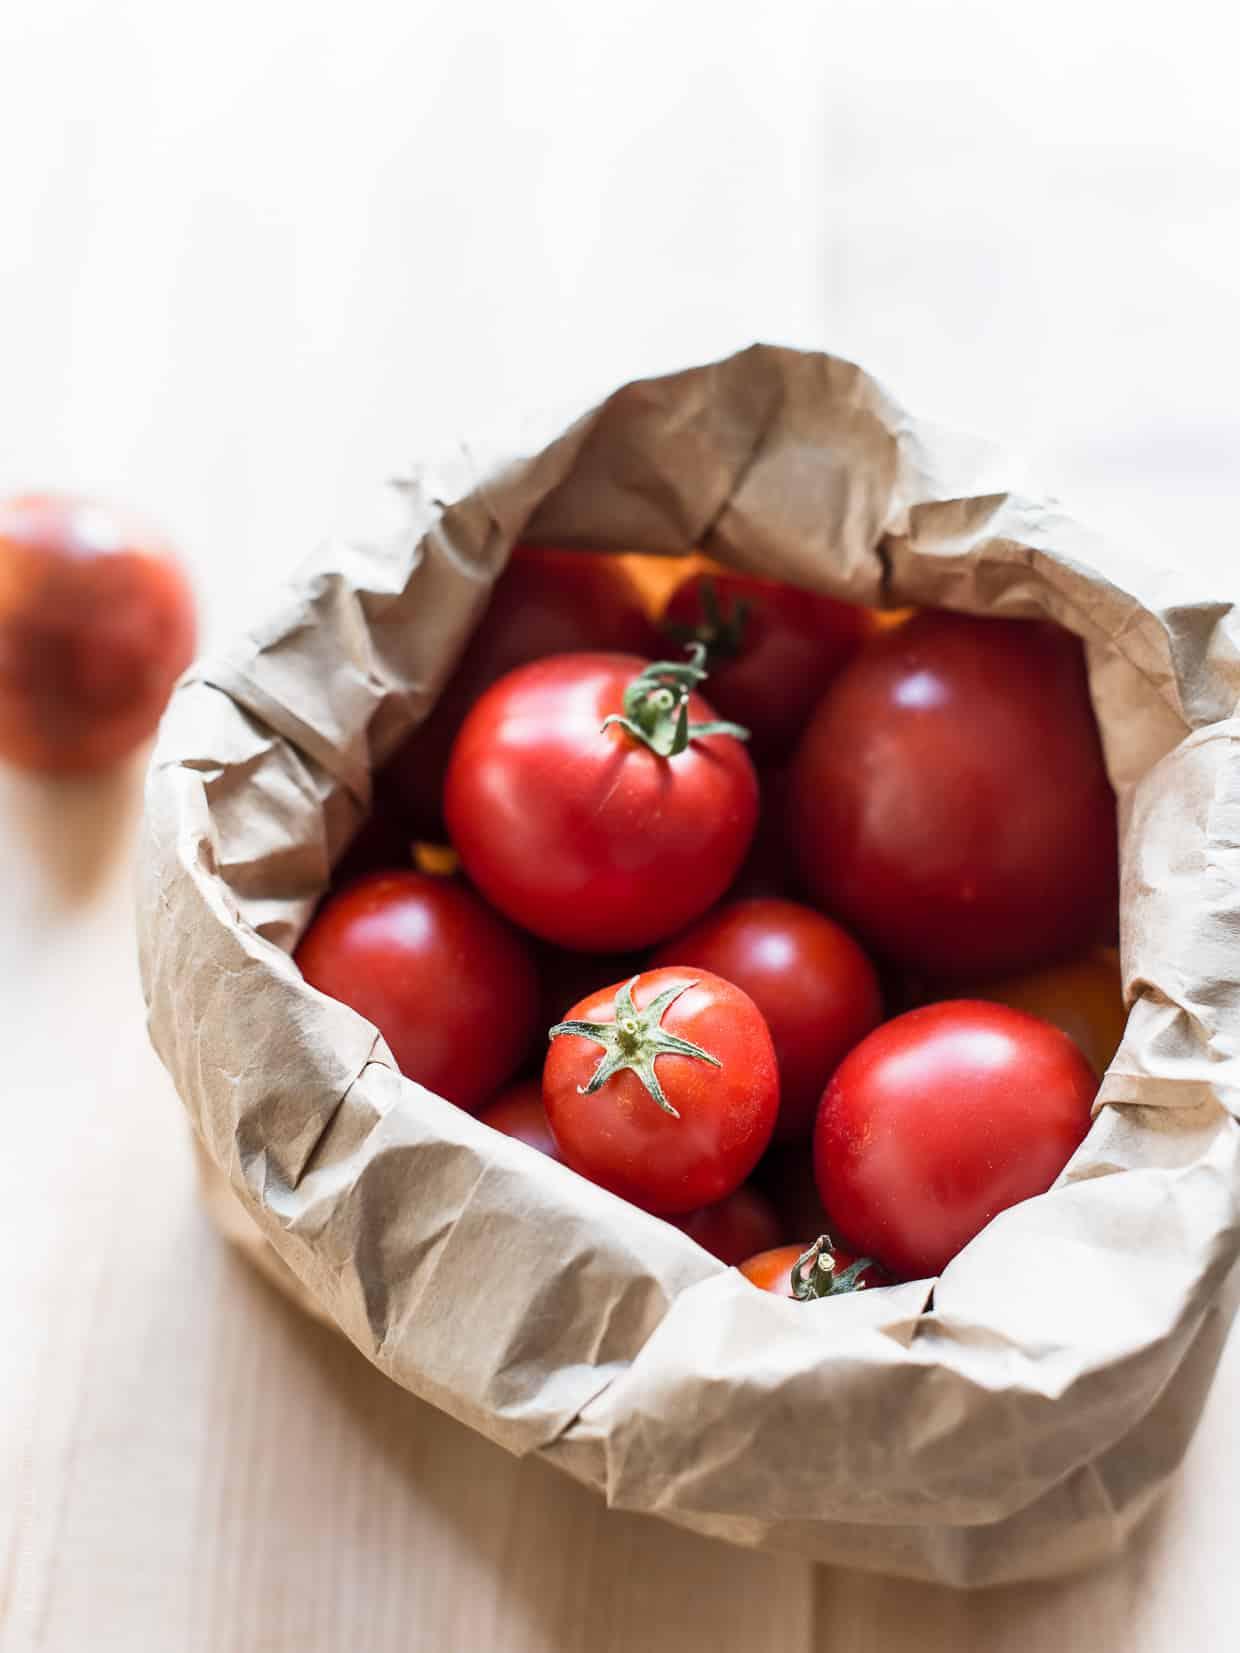 Fresh Heirloom Tomatoes in a paper sack.